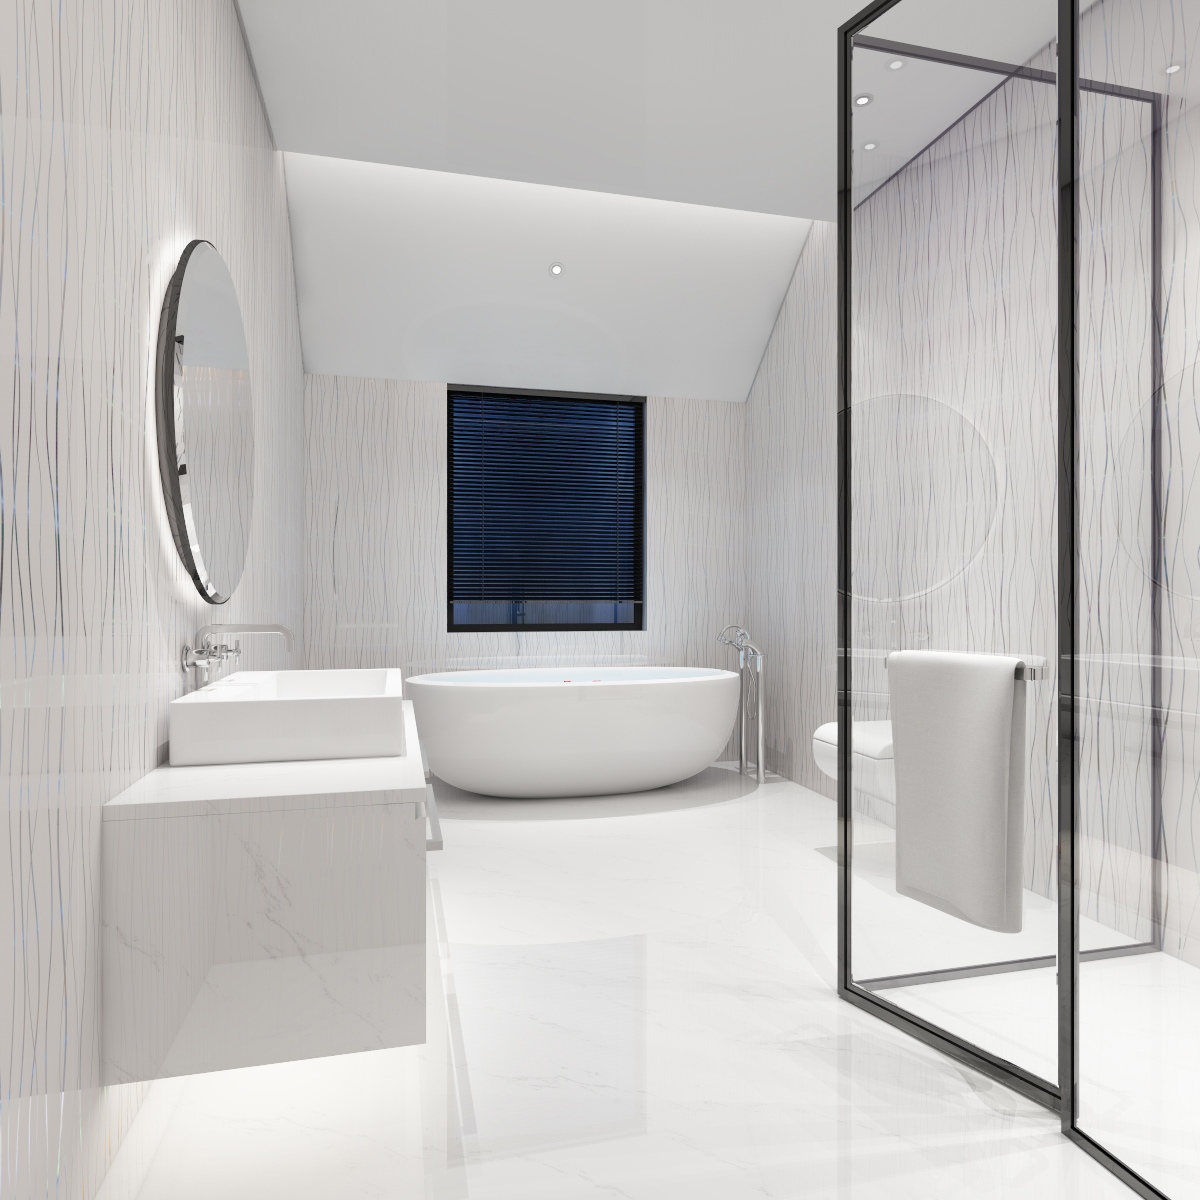 Water ripples PVC Bathroom Cladding Ceiling Panels Shower ...